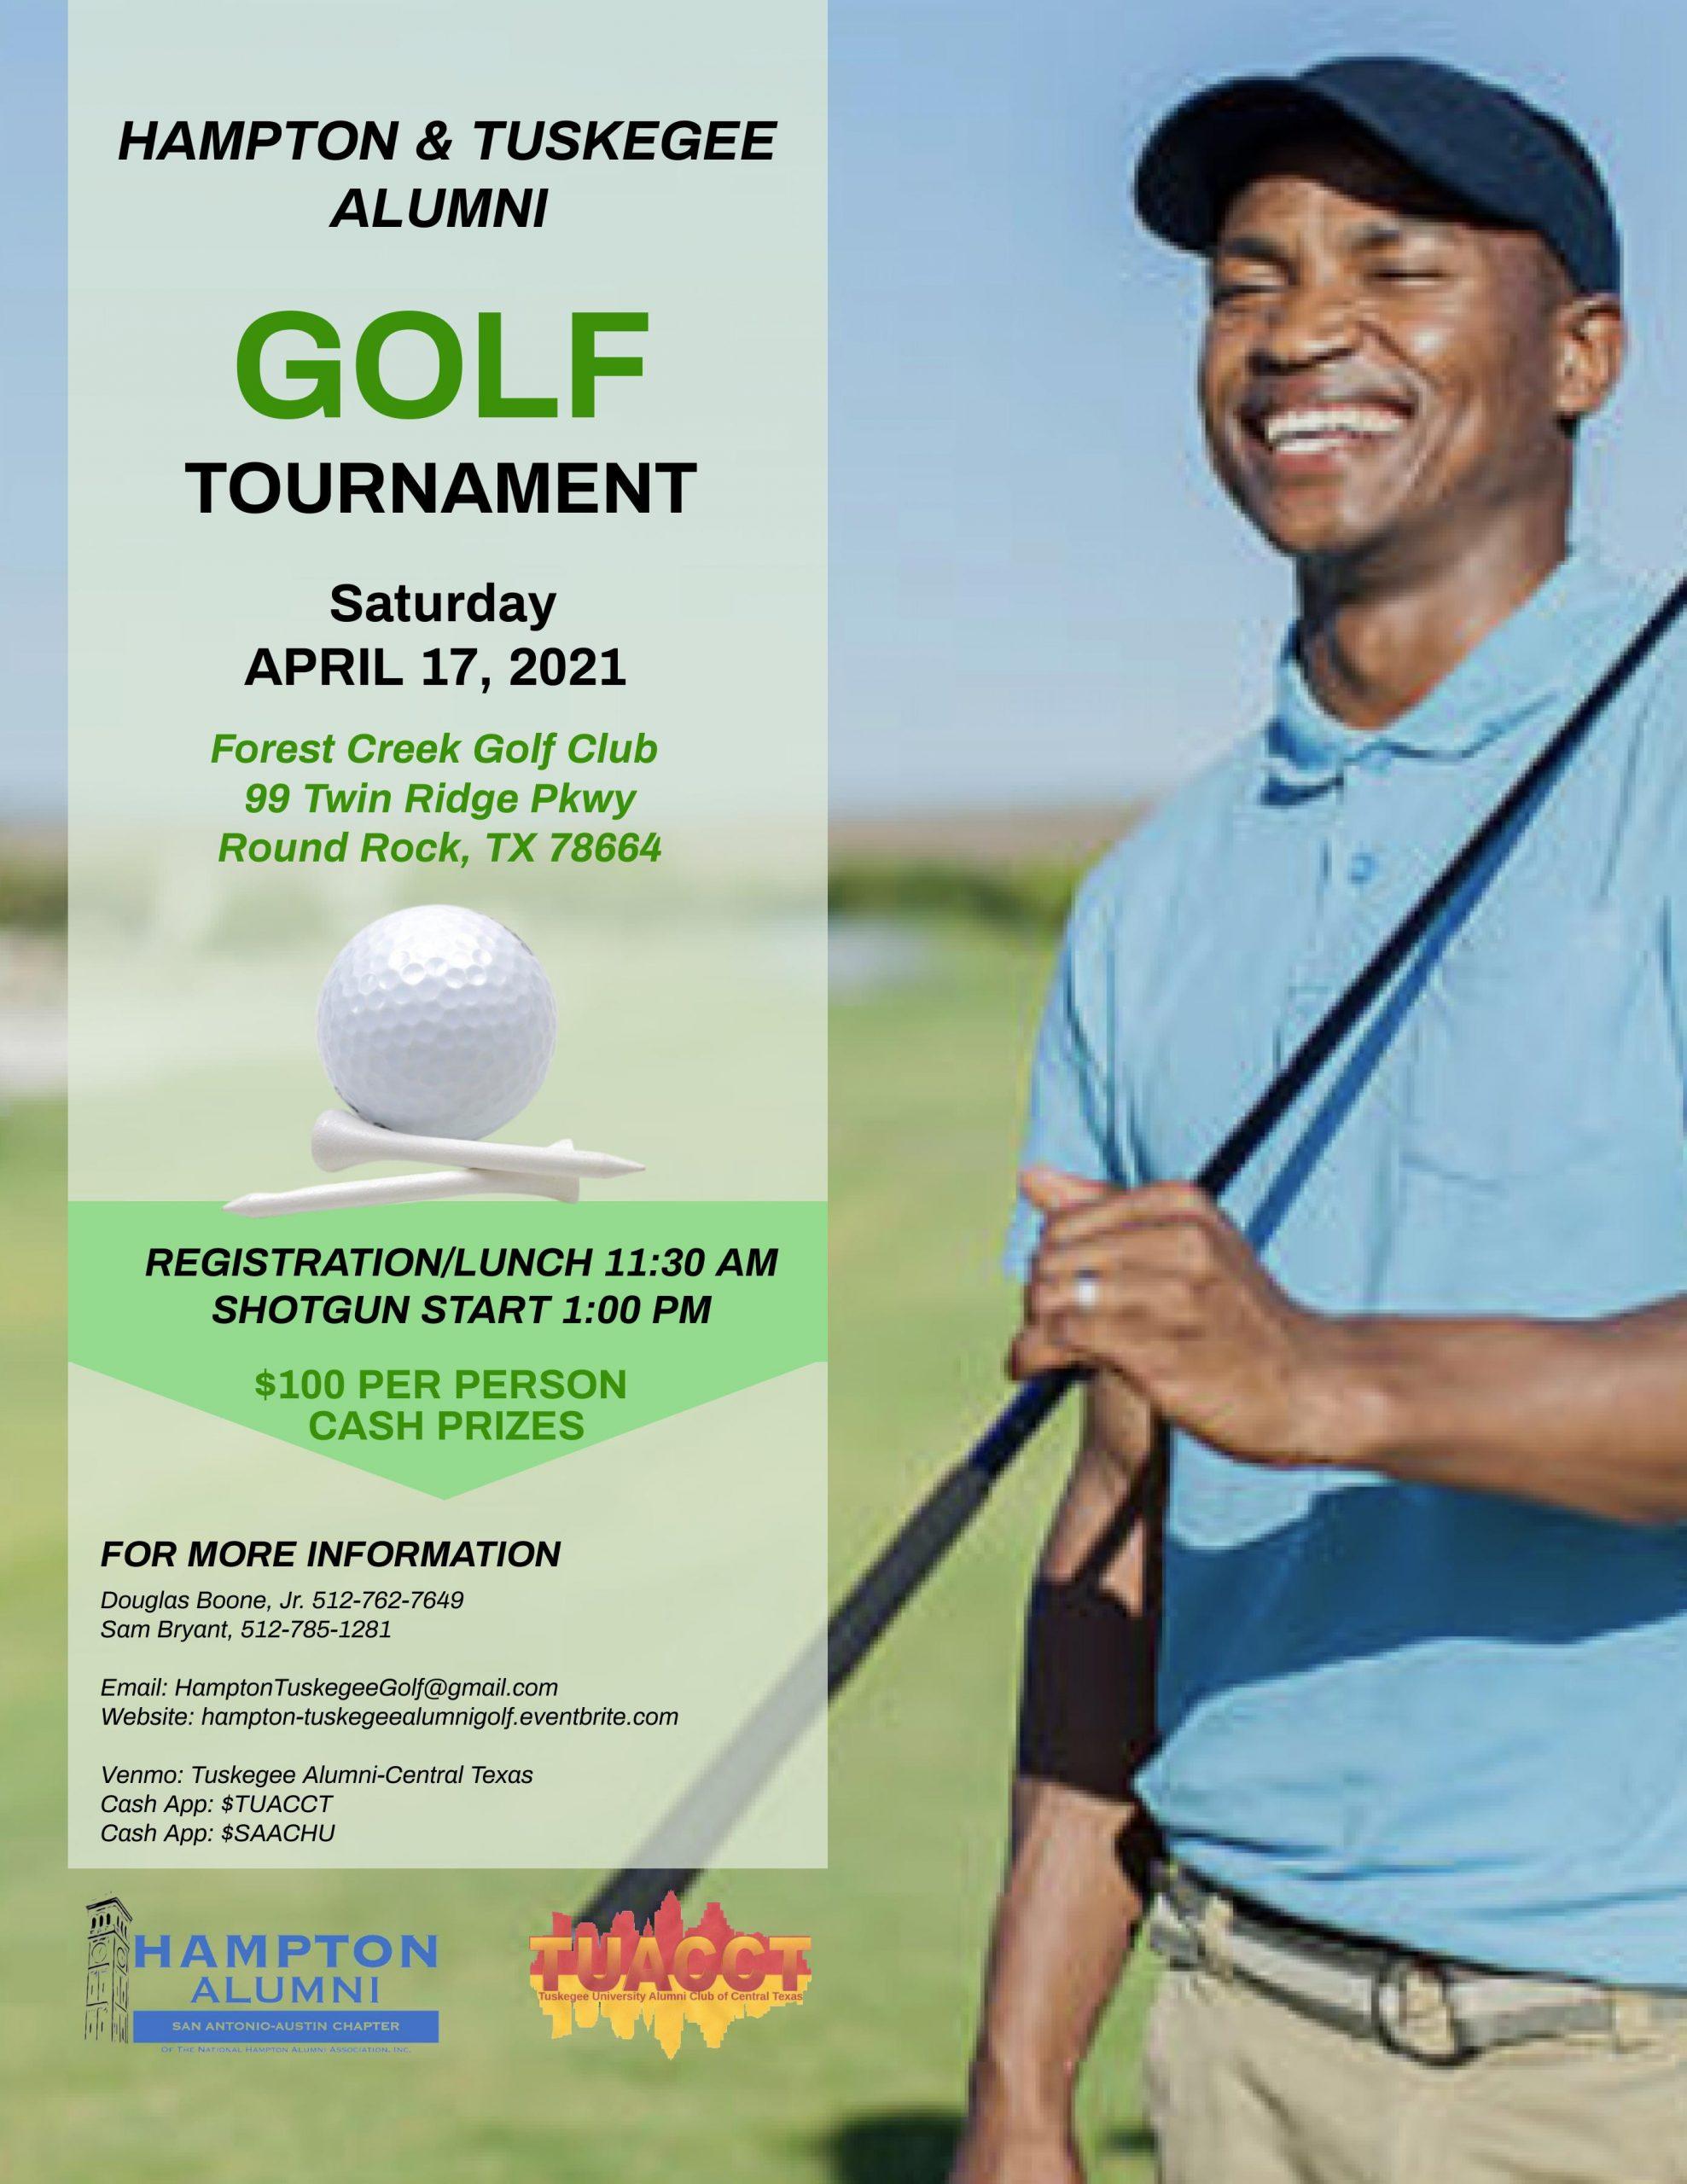 Hampton & Tuskegee Alumni Golf Tournament